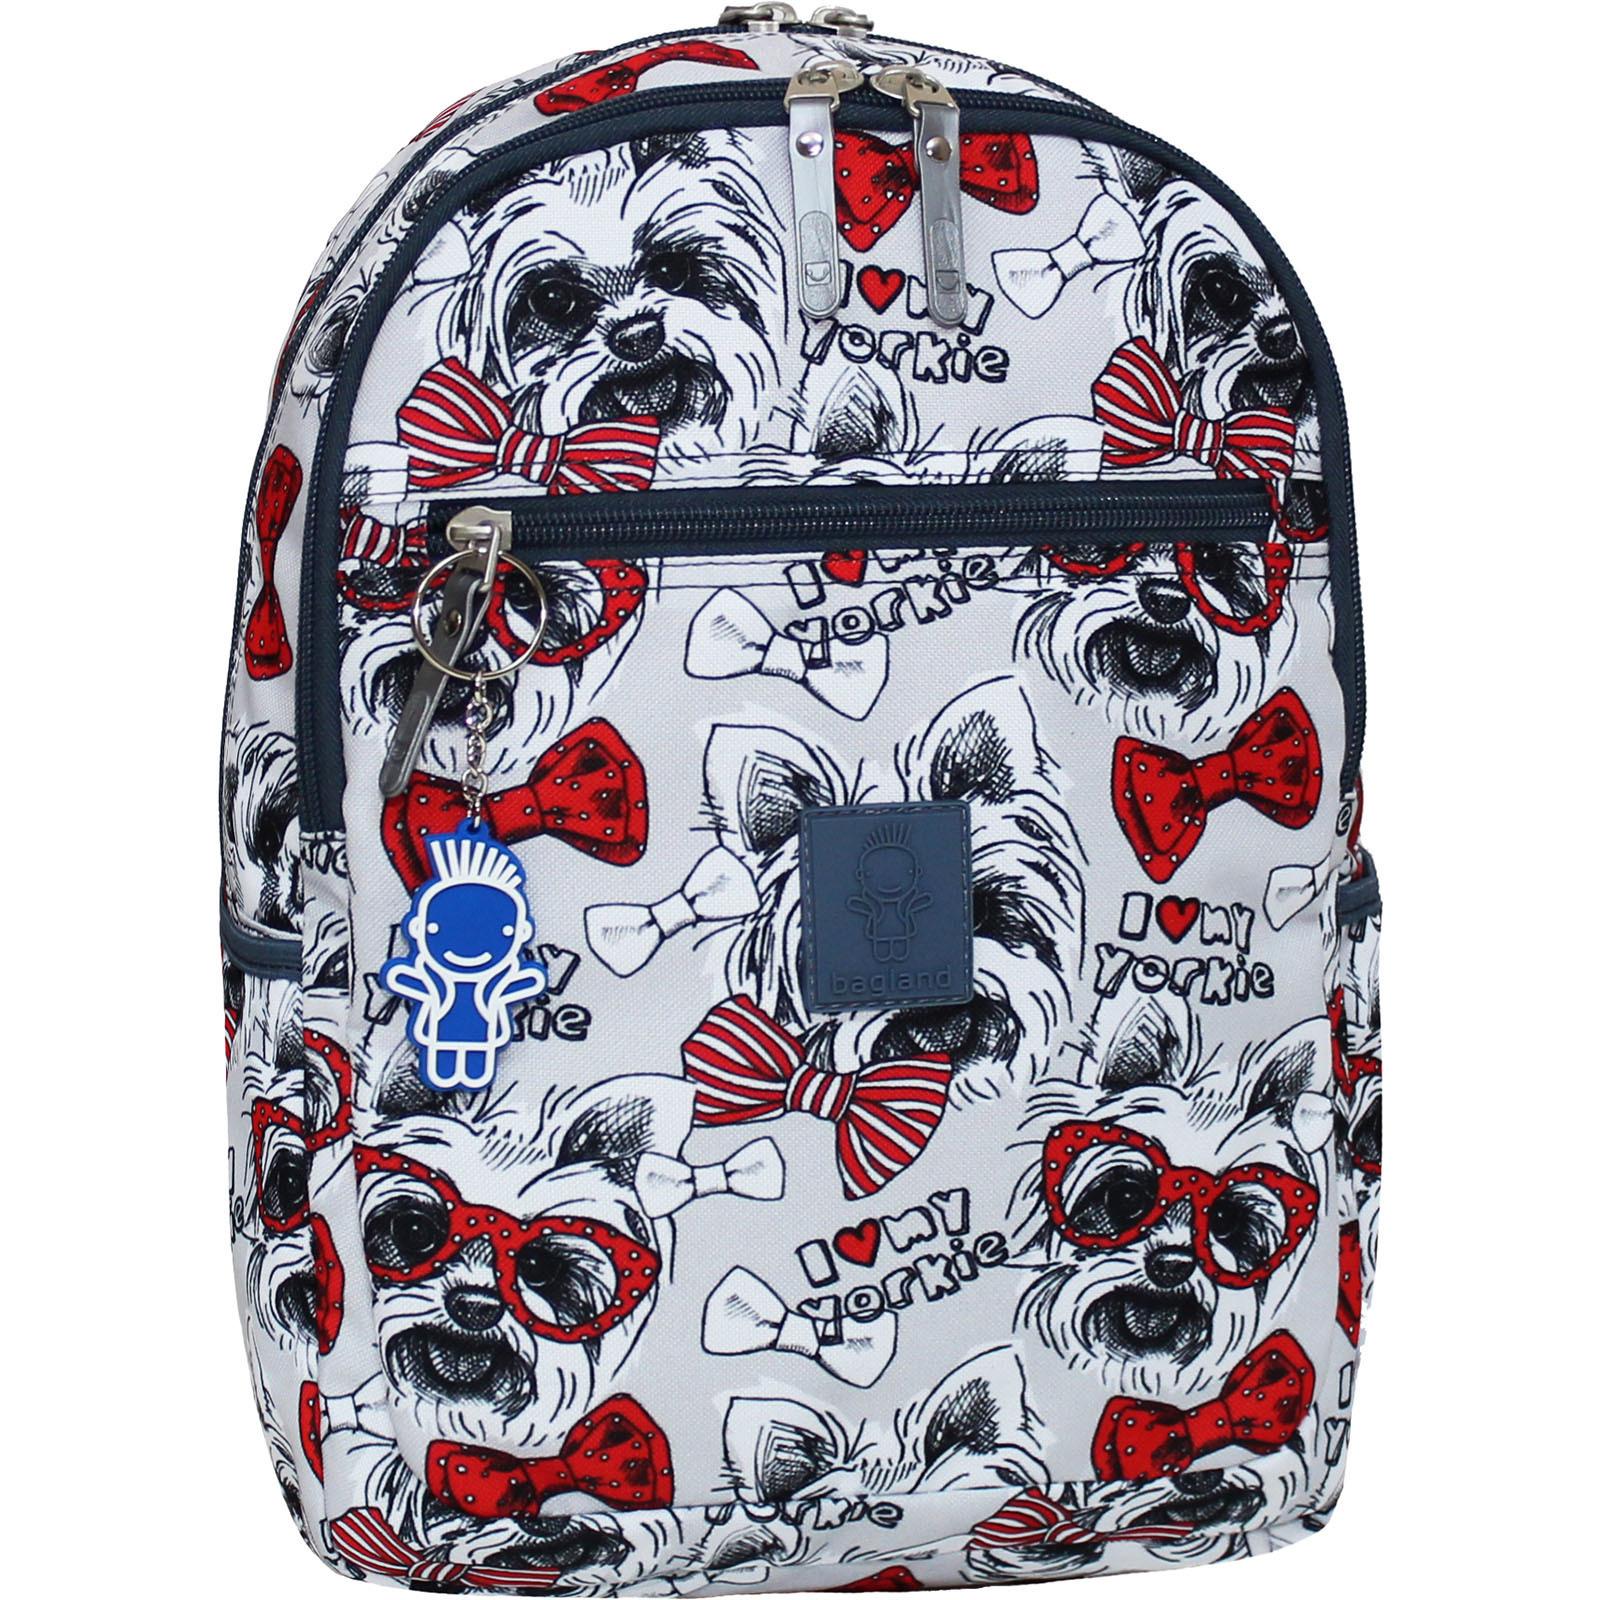 Детские рюкзаки Рюкзак Bagland Young 13 л. сублімація 179 (00510664) IMG_9545_179.JPG